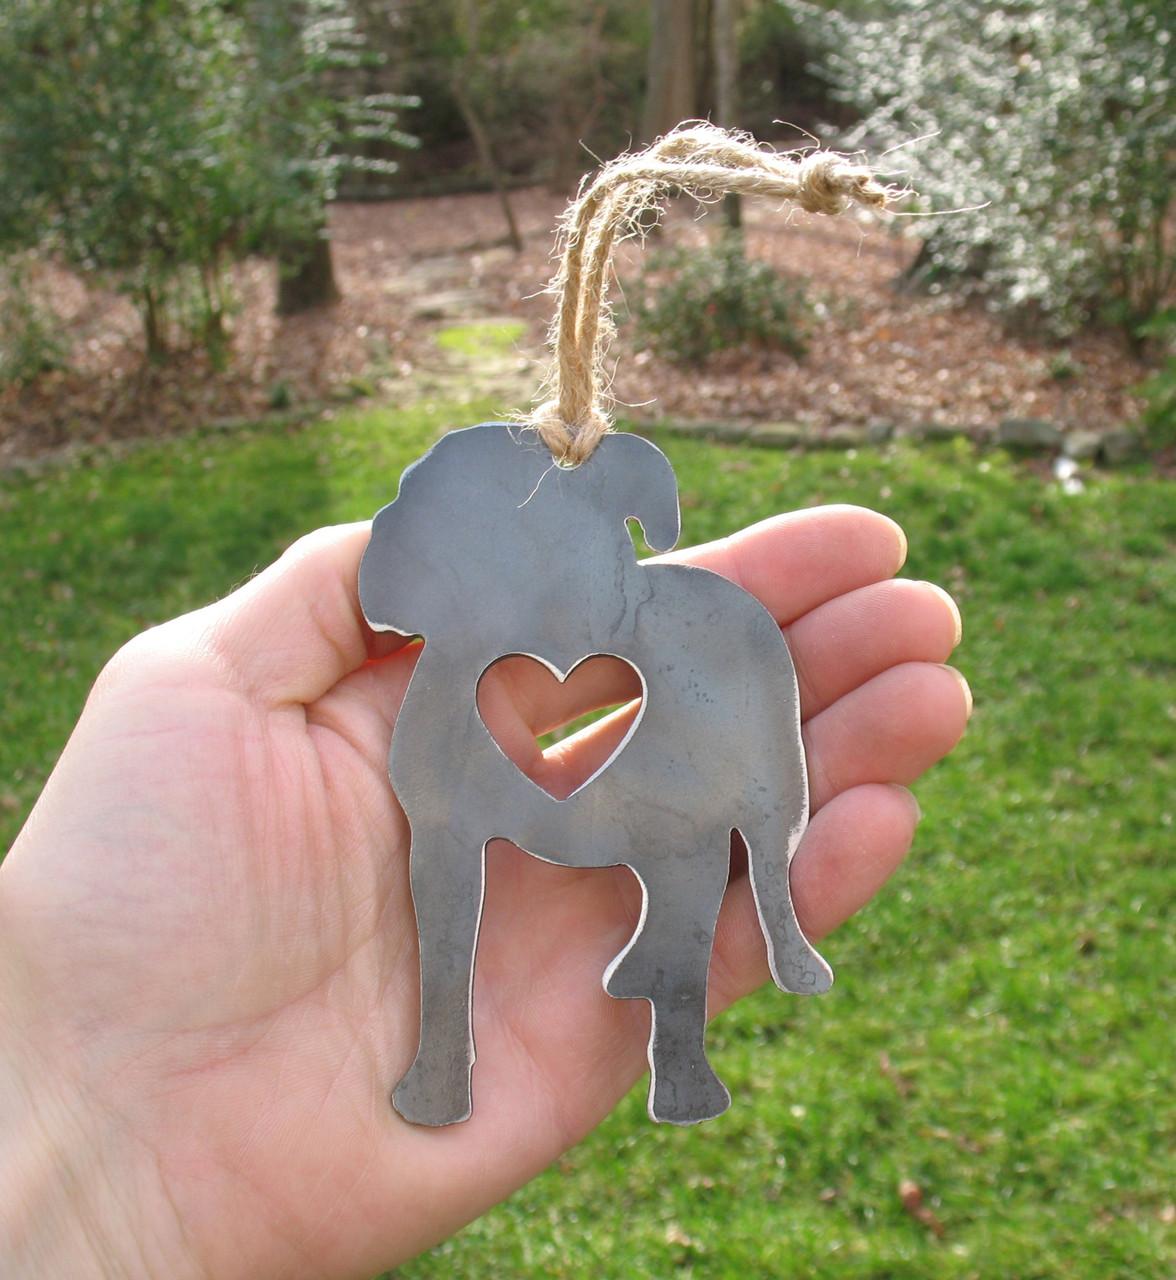 American Bulldog Dog Ornament - Metal Dog Christmas Ornament - Pet Lover Memorial Ornament - Pet Loss Dog Memorial Ornament Remembrance Gift